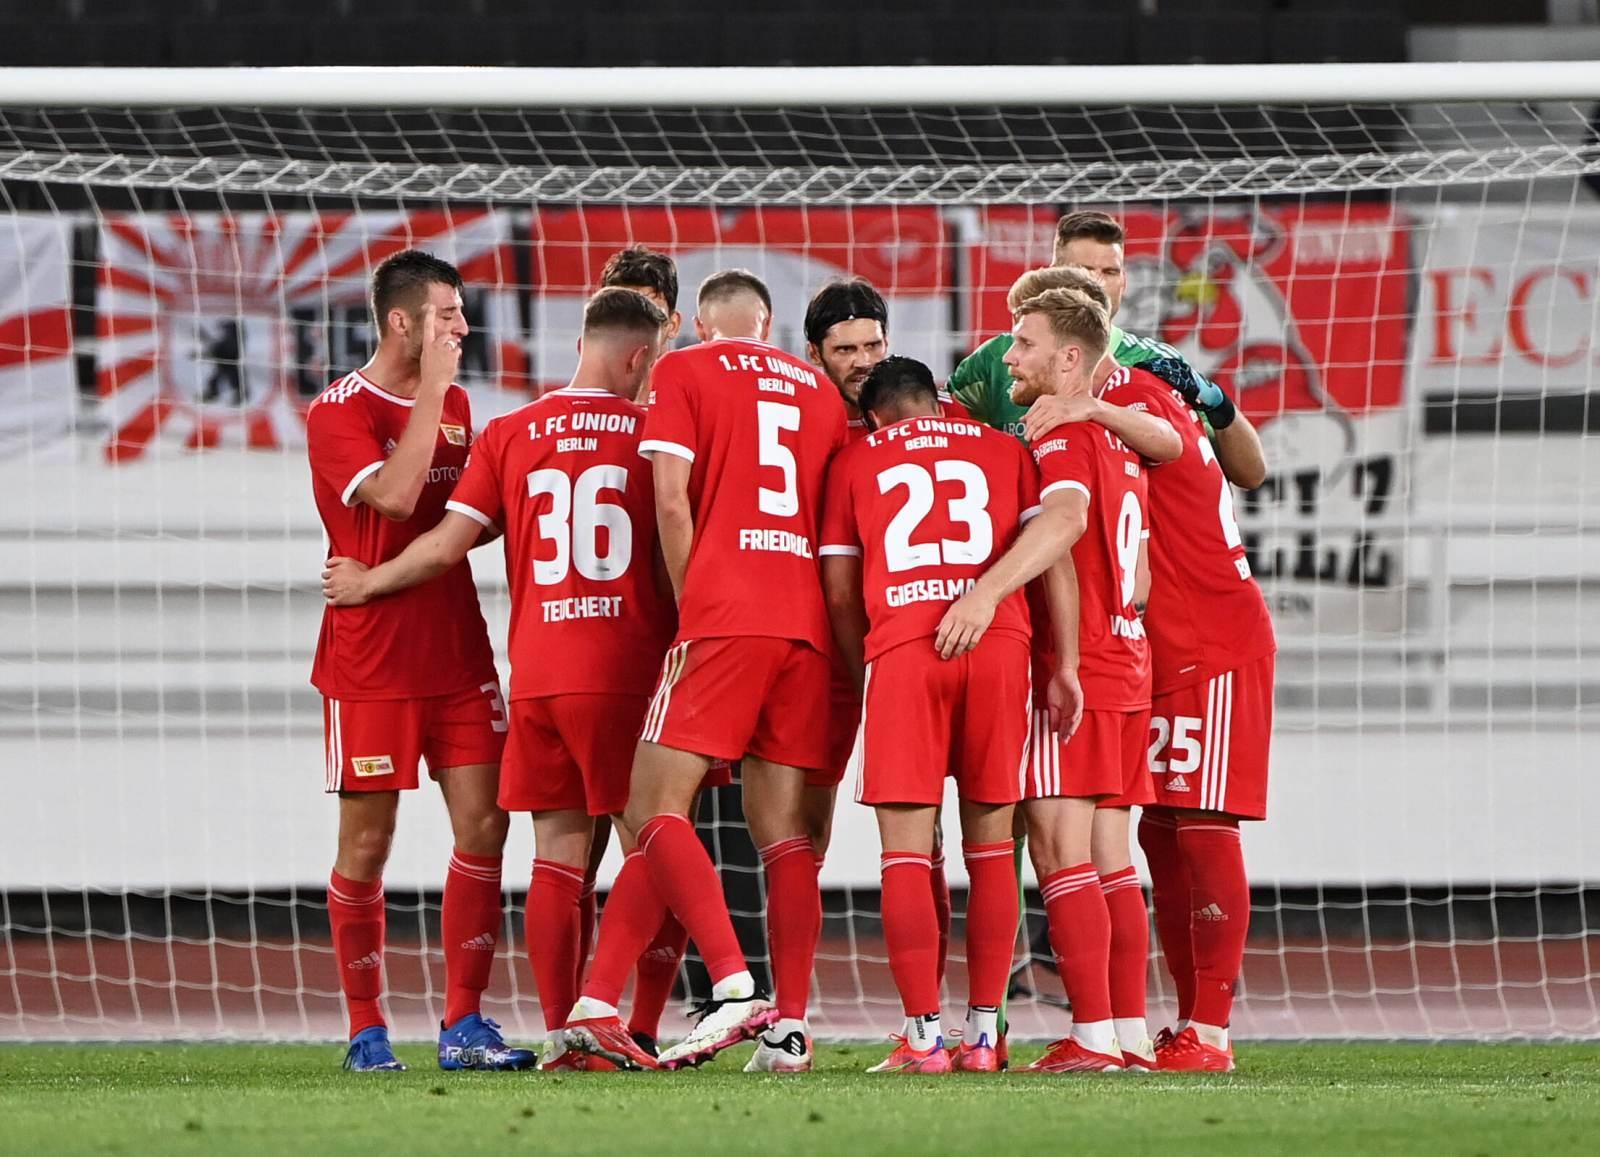 «Унион Берлин» - «Боруссия» М: прогноз и ставка на матч чемпионата Германии - 29 августа 2021